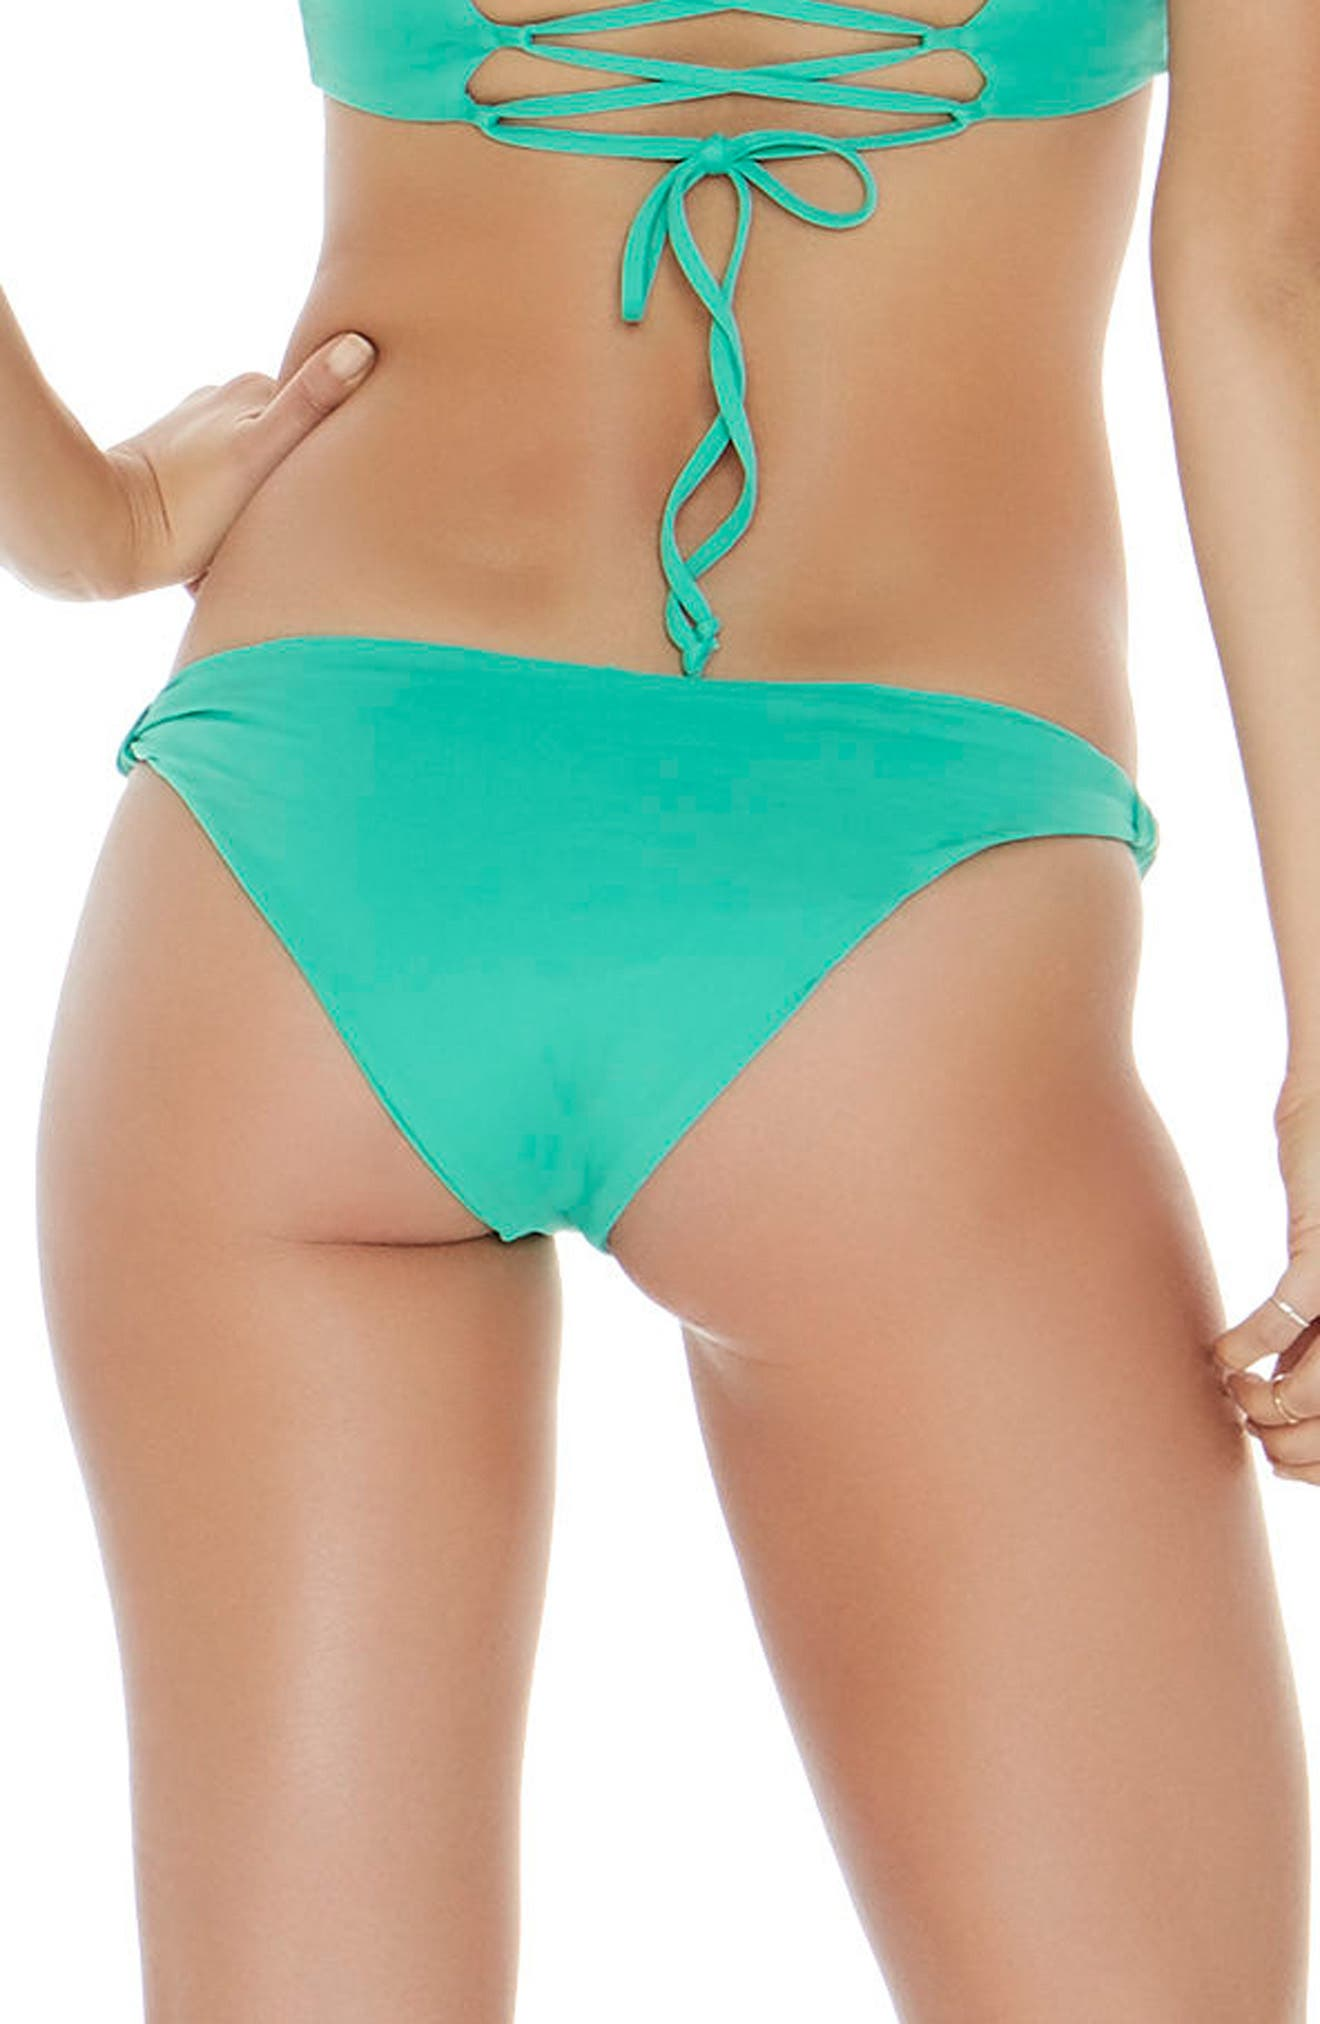 Sundrop Slider Bikini Bottoms,                             Alternate thumbnail 2, color,                             Spearmint